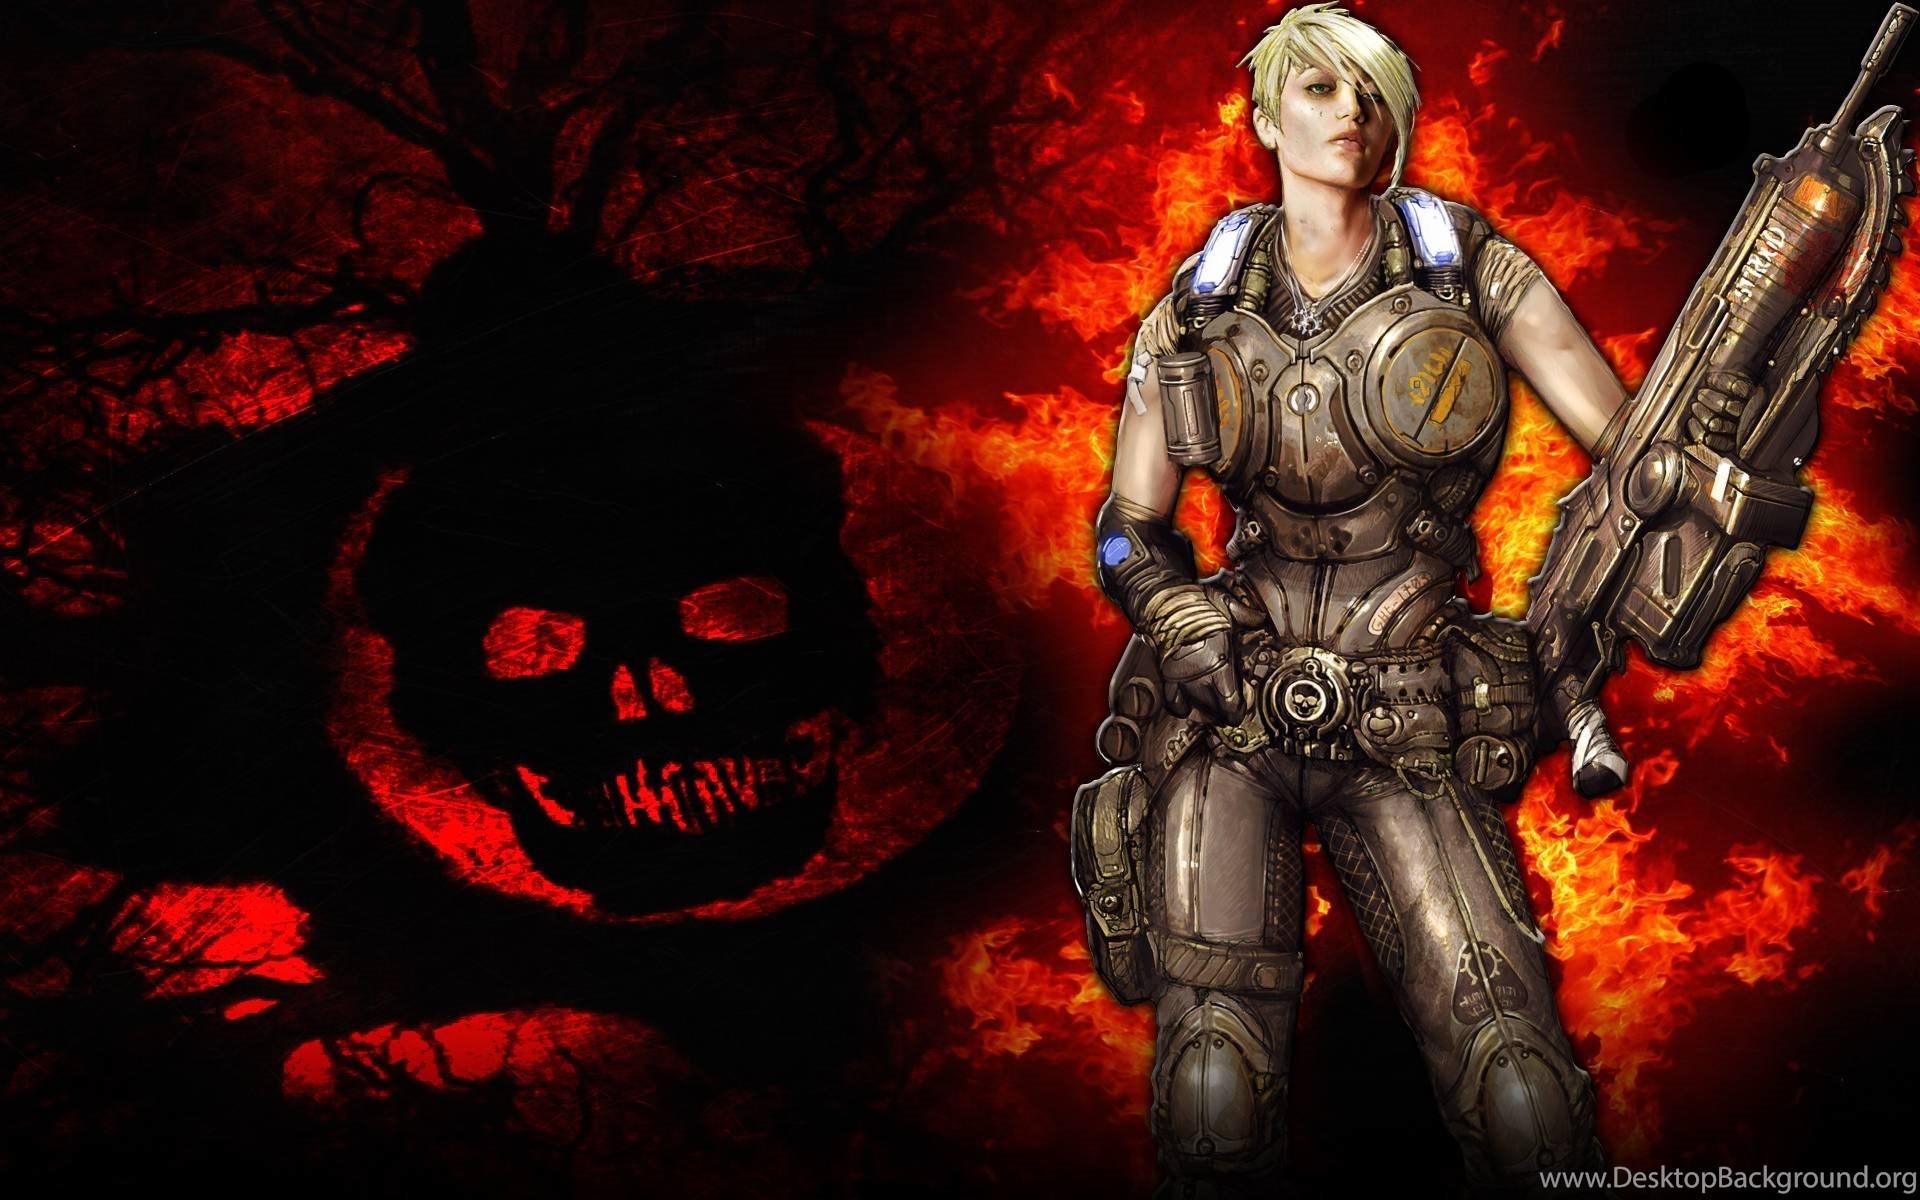 gears of war 3 wallpapers game wallpapers hd great woman desktop